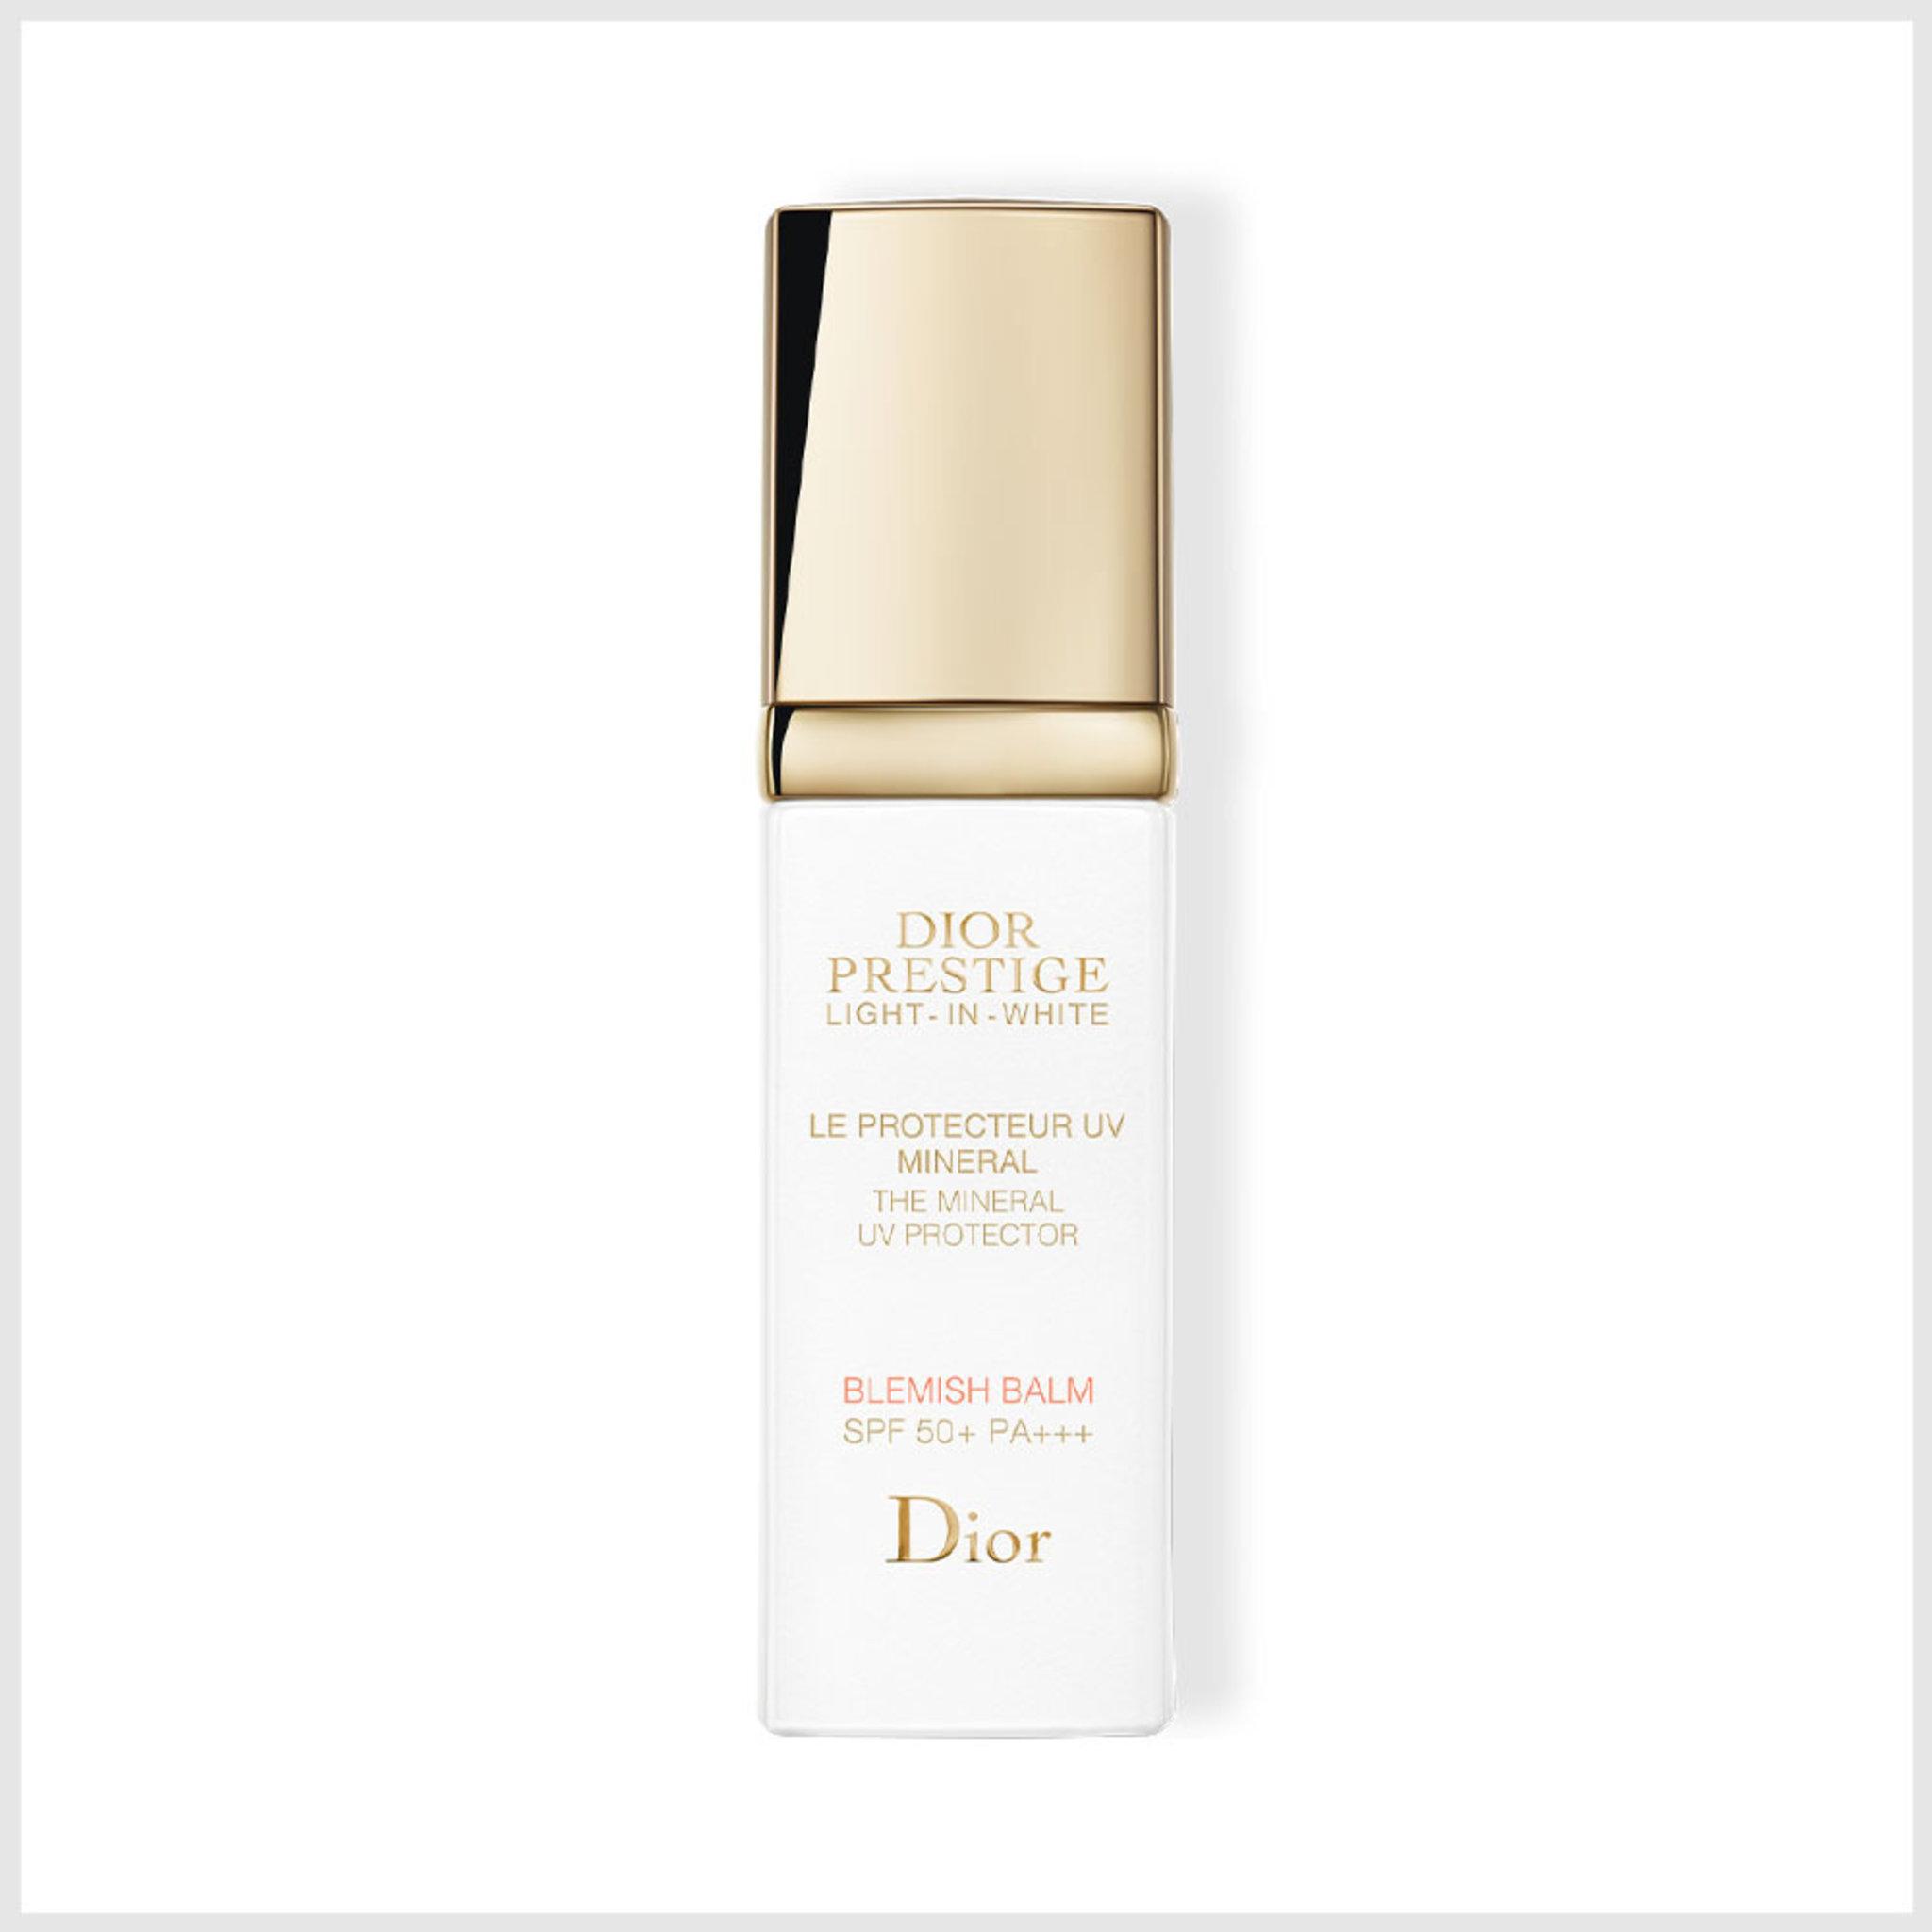 Dior Prestige Light-In-WhiteThe Mineral UV ProtectorBlemish Balm SPF 50+ PA+++